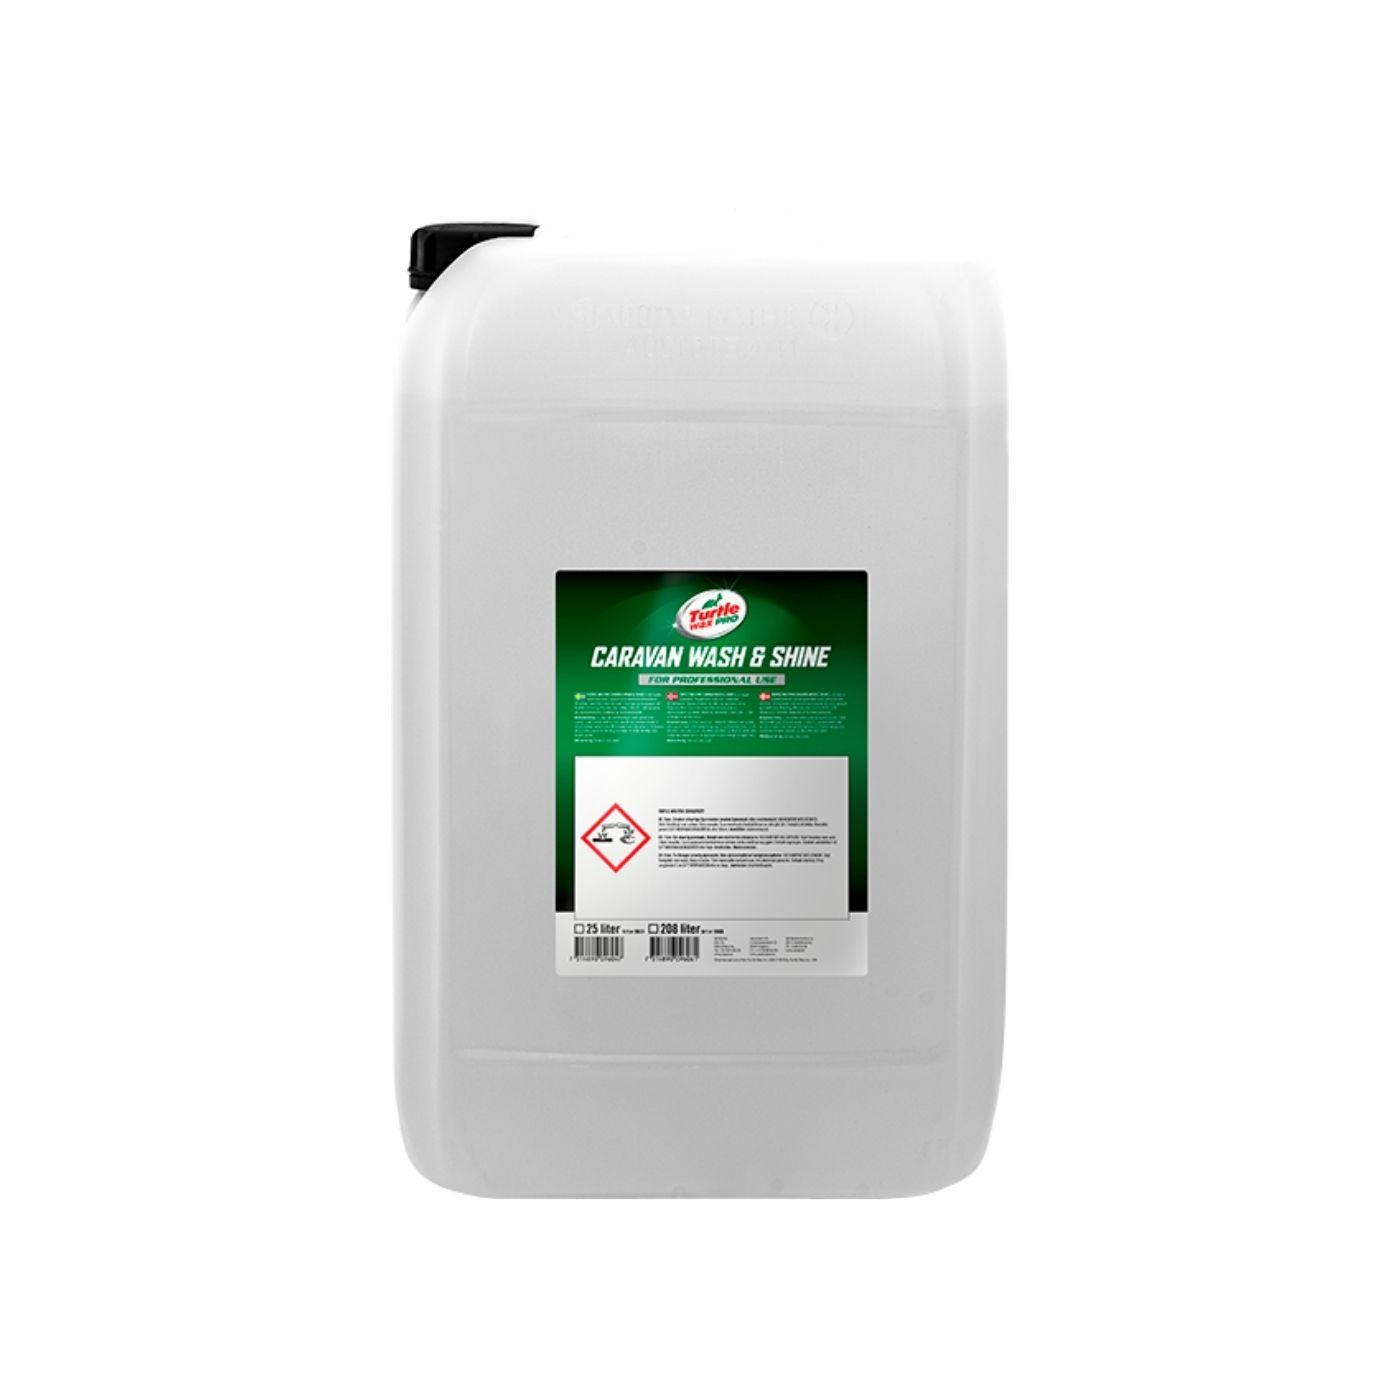 Husvagnsschampo Turtle Wax Pro Caravan Wash & Shine, 208 000 ml